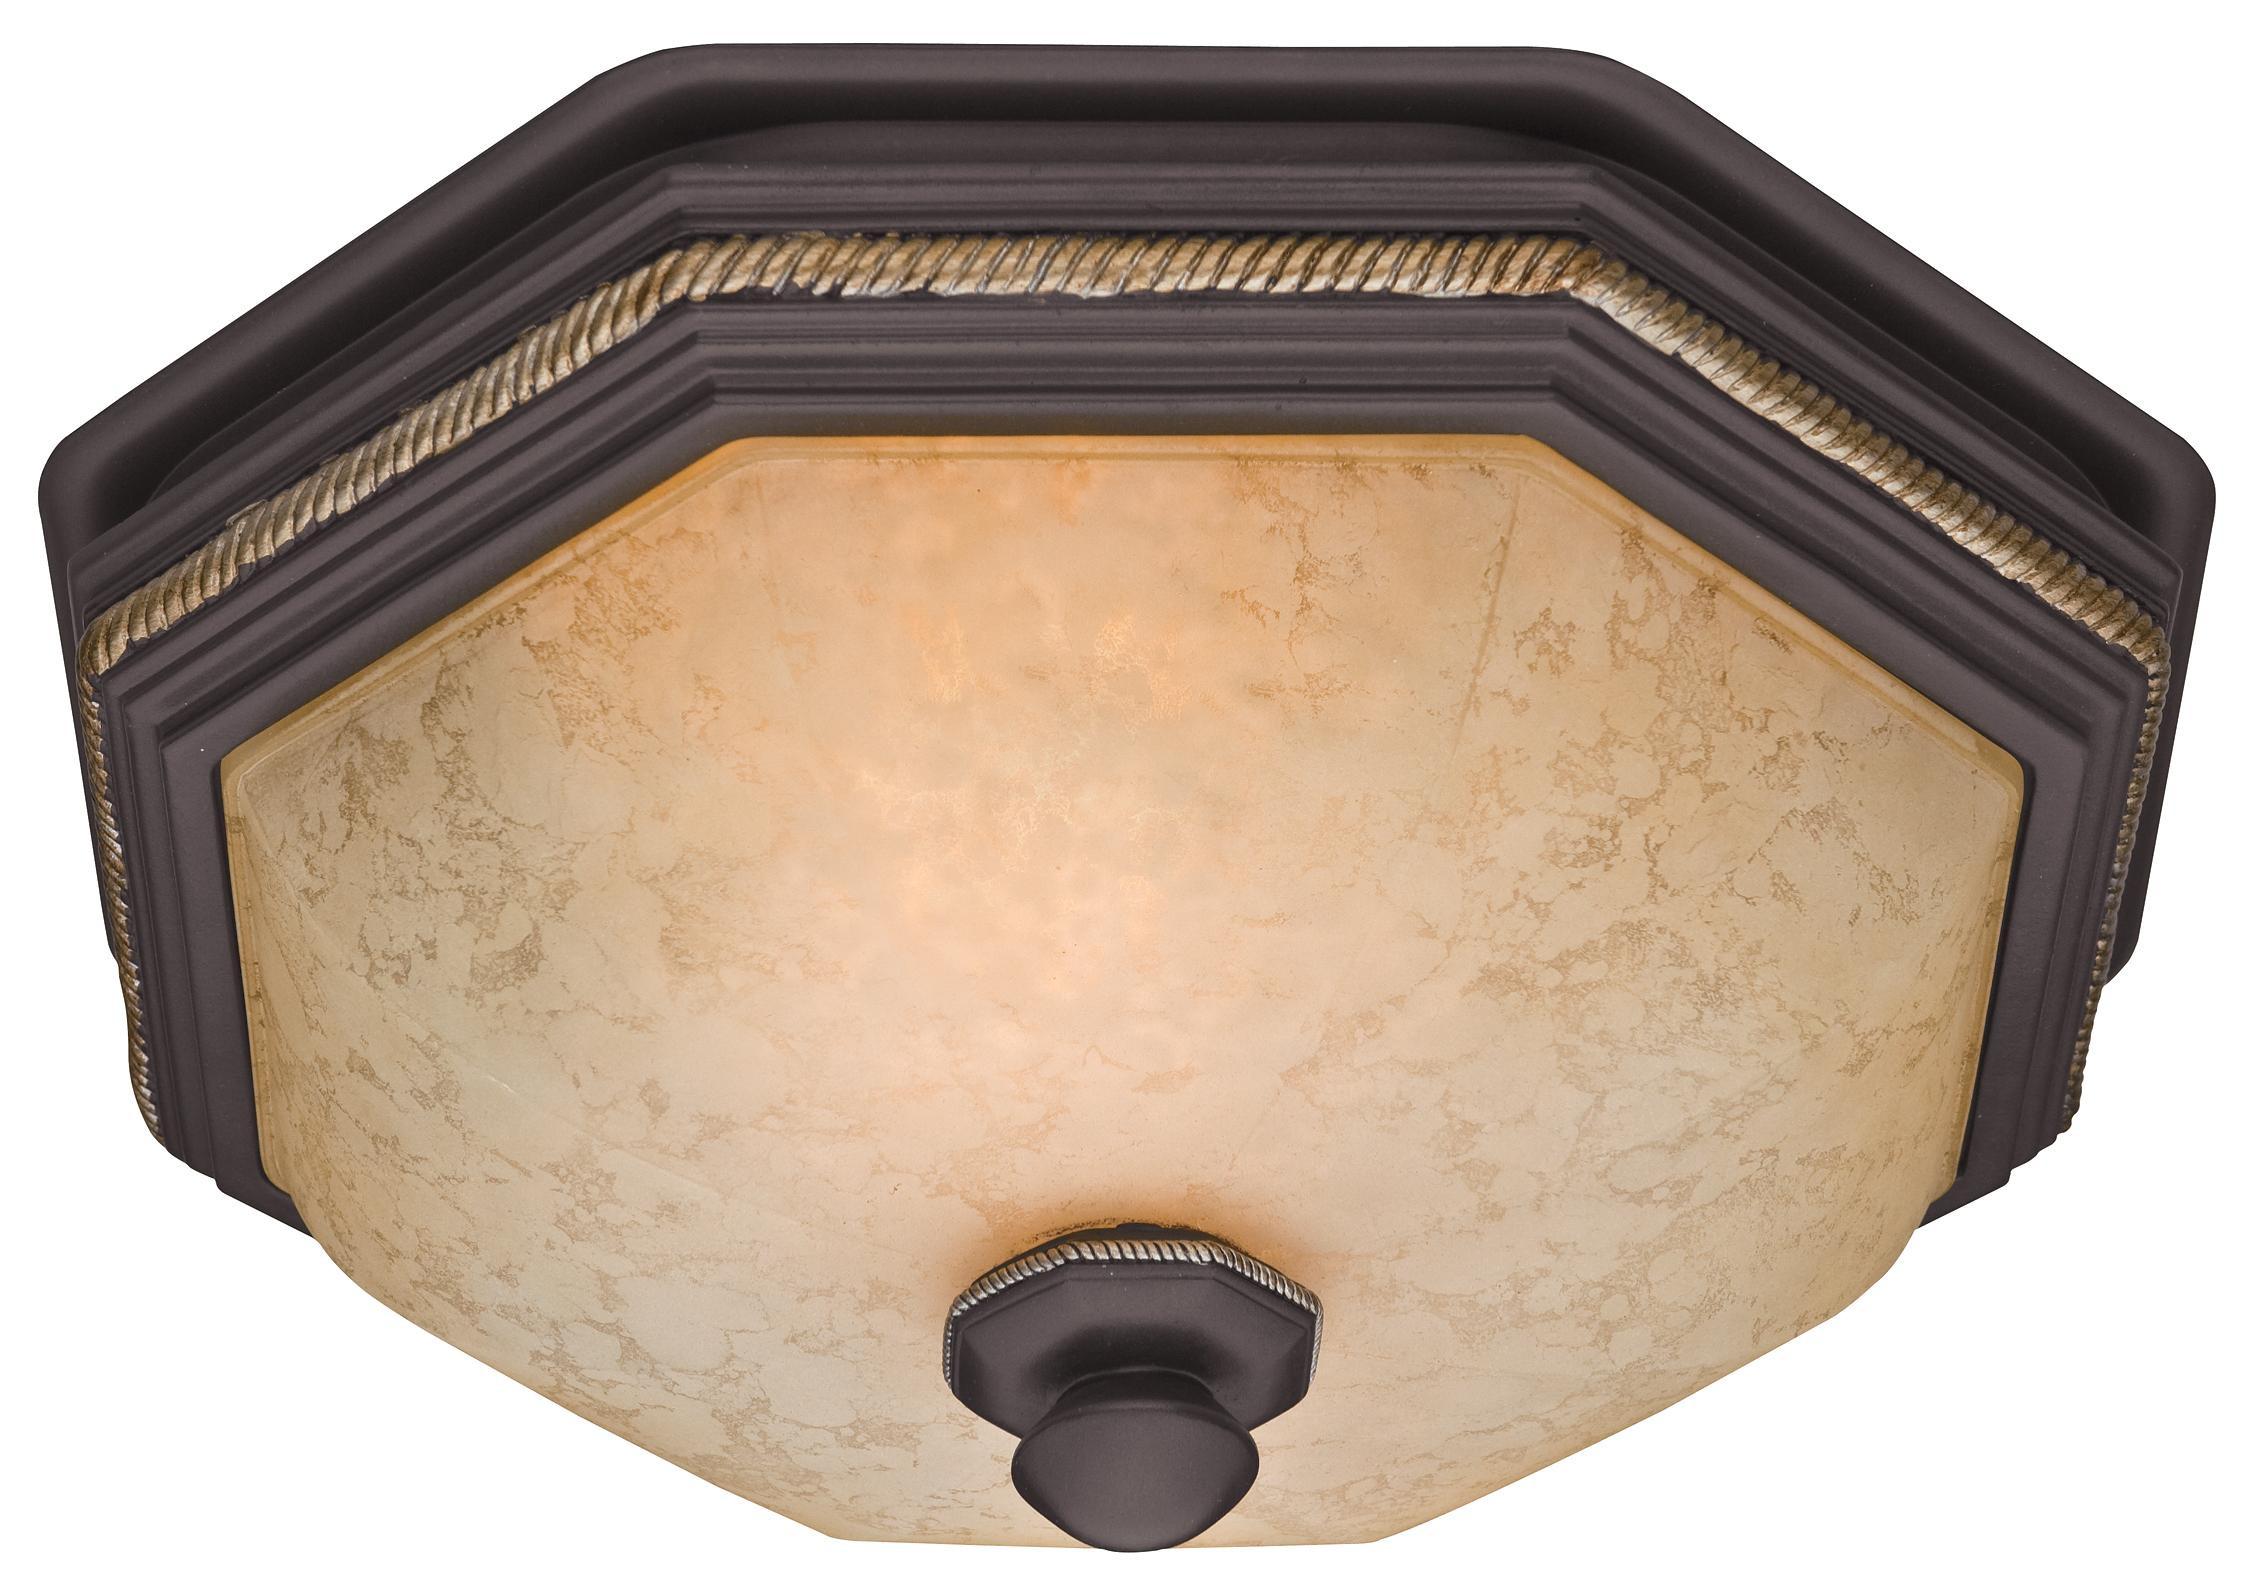 Bathroom Vent And Light  Bathroom exhaust fan bathroom fan light bathroom fan